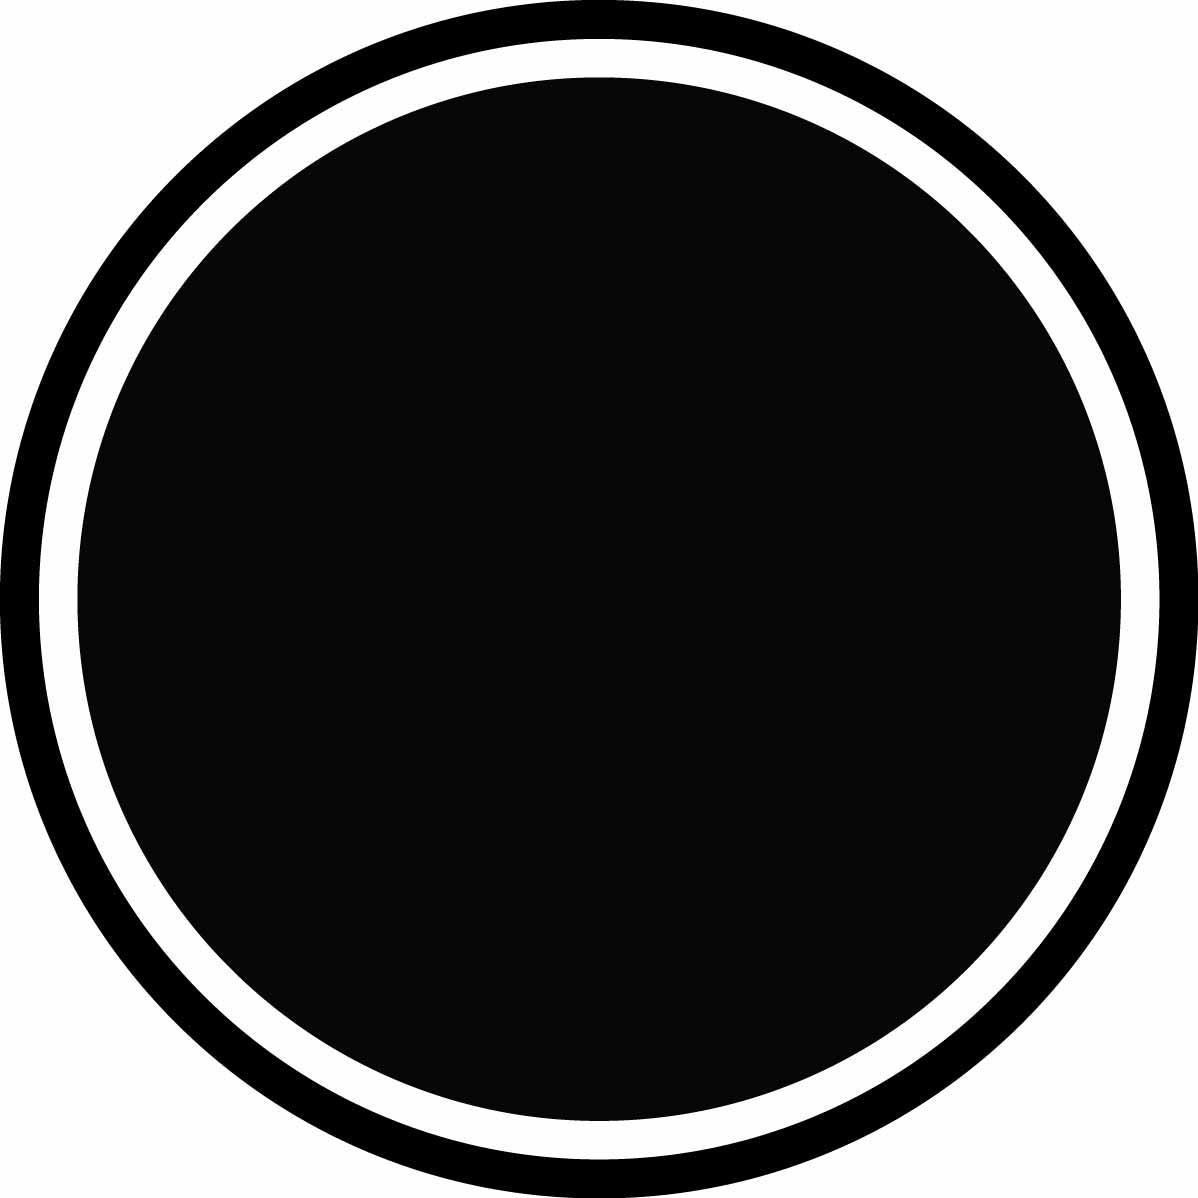 1198x1198 Circle 006.jpg